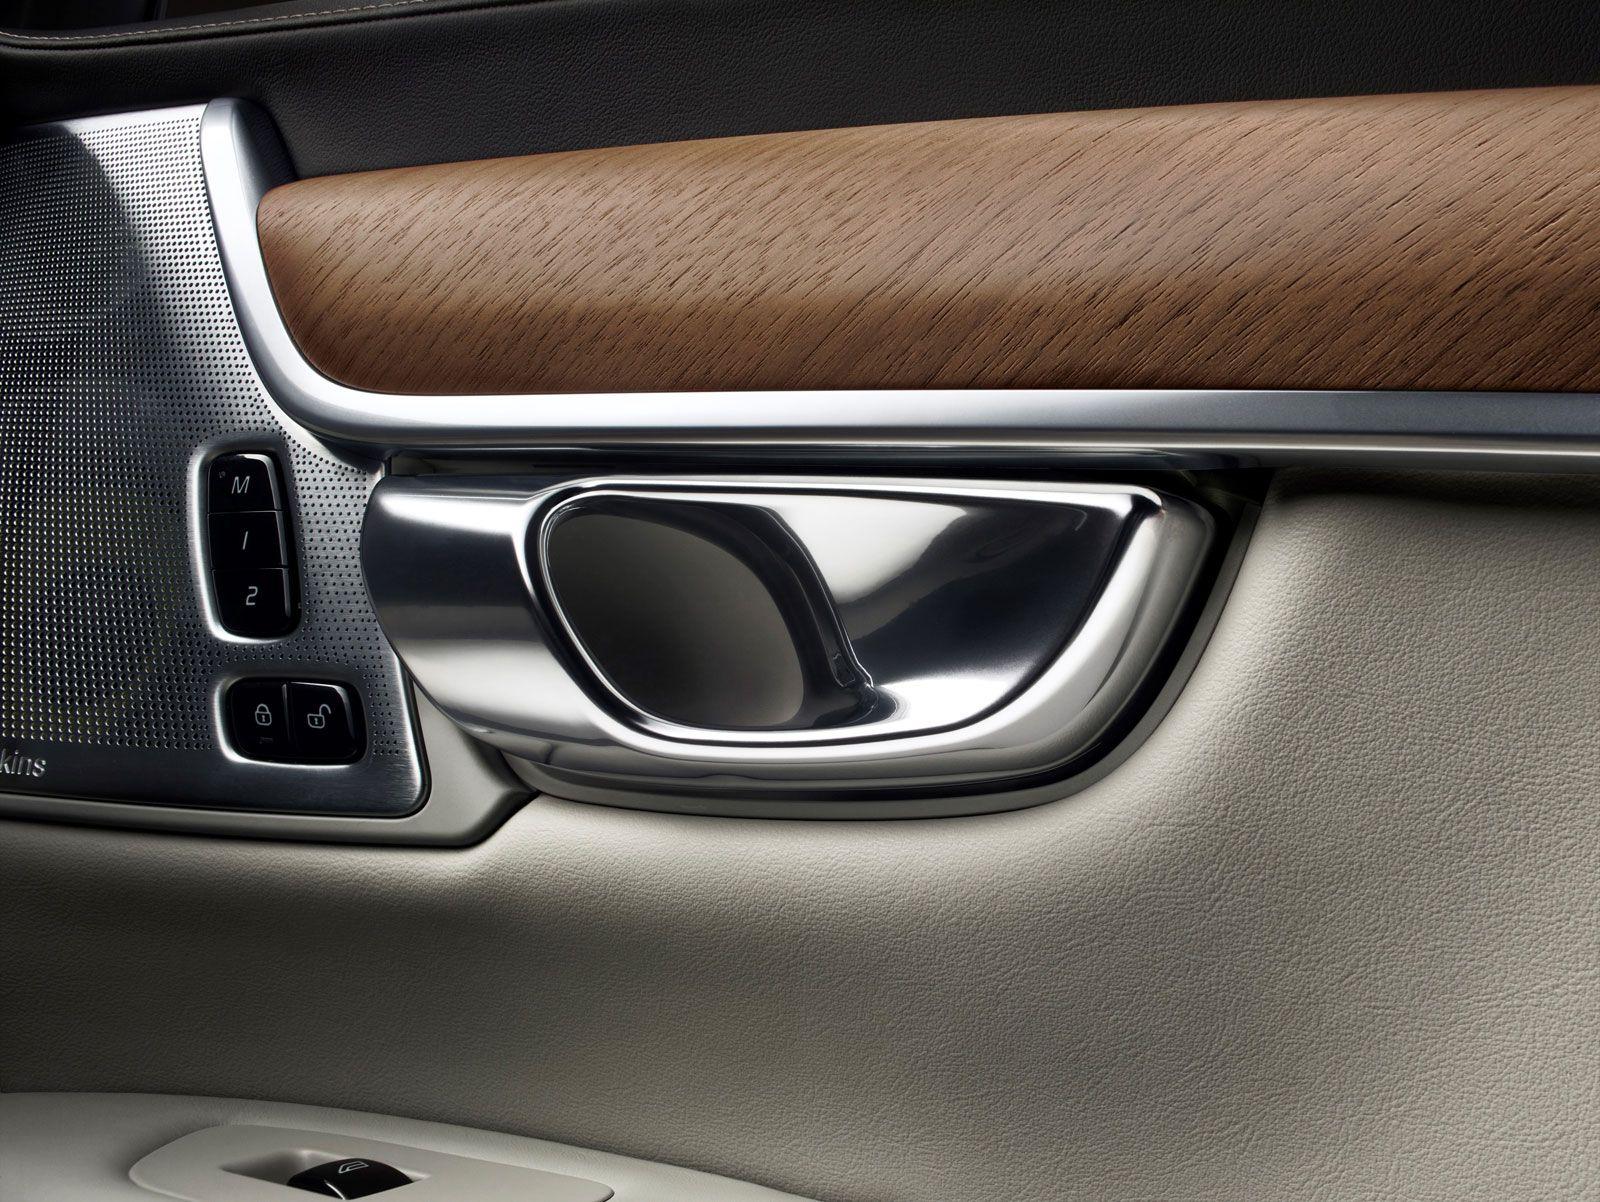 Volvo S90 Interior >> Volvo S90 Interior Door Handle Volvo S90 Volvo Cars Volvo